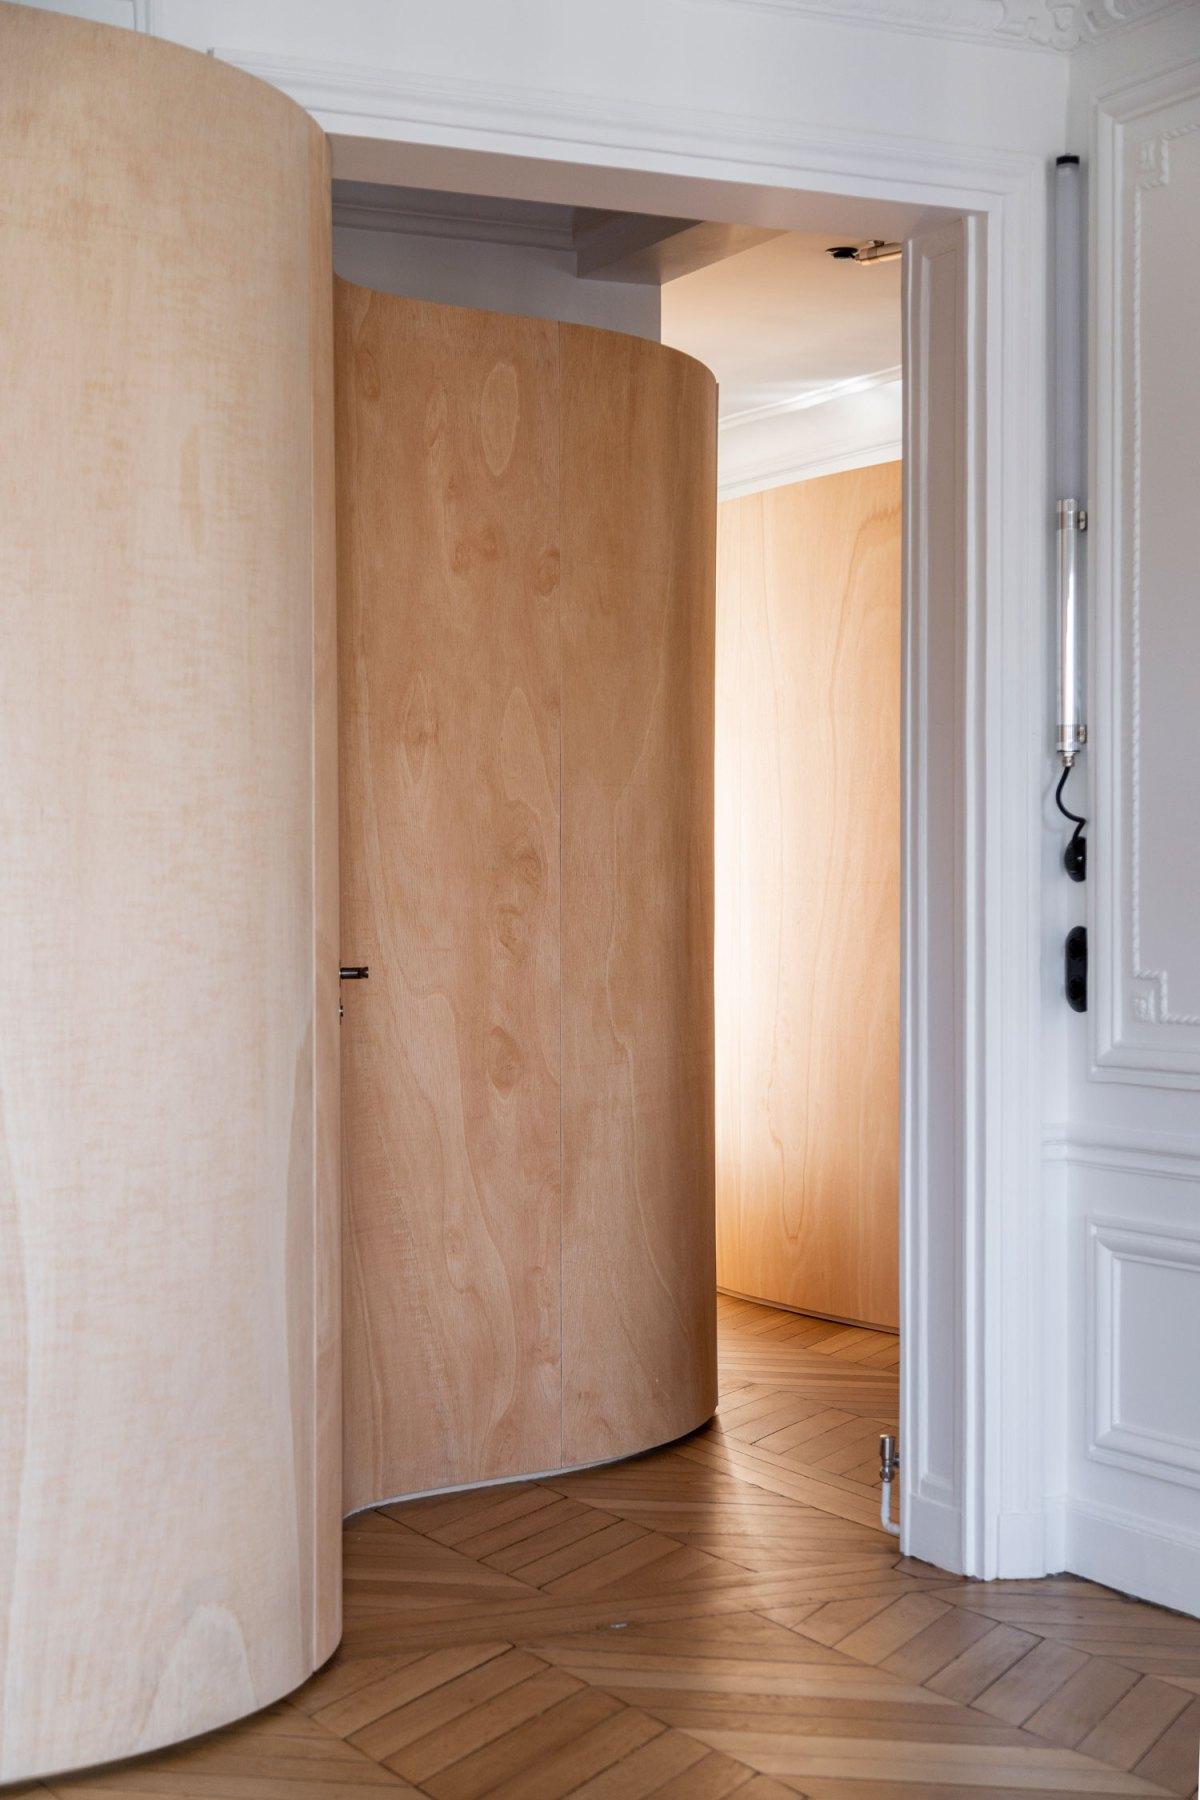 Wooden Ribbon Paris Apartment Renovation Gabrielle Toledano Architects Yellowtrace